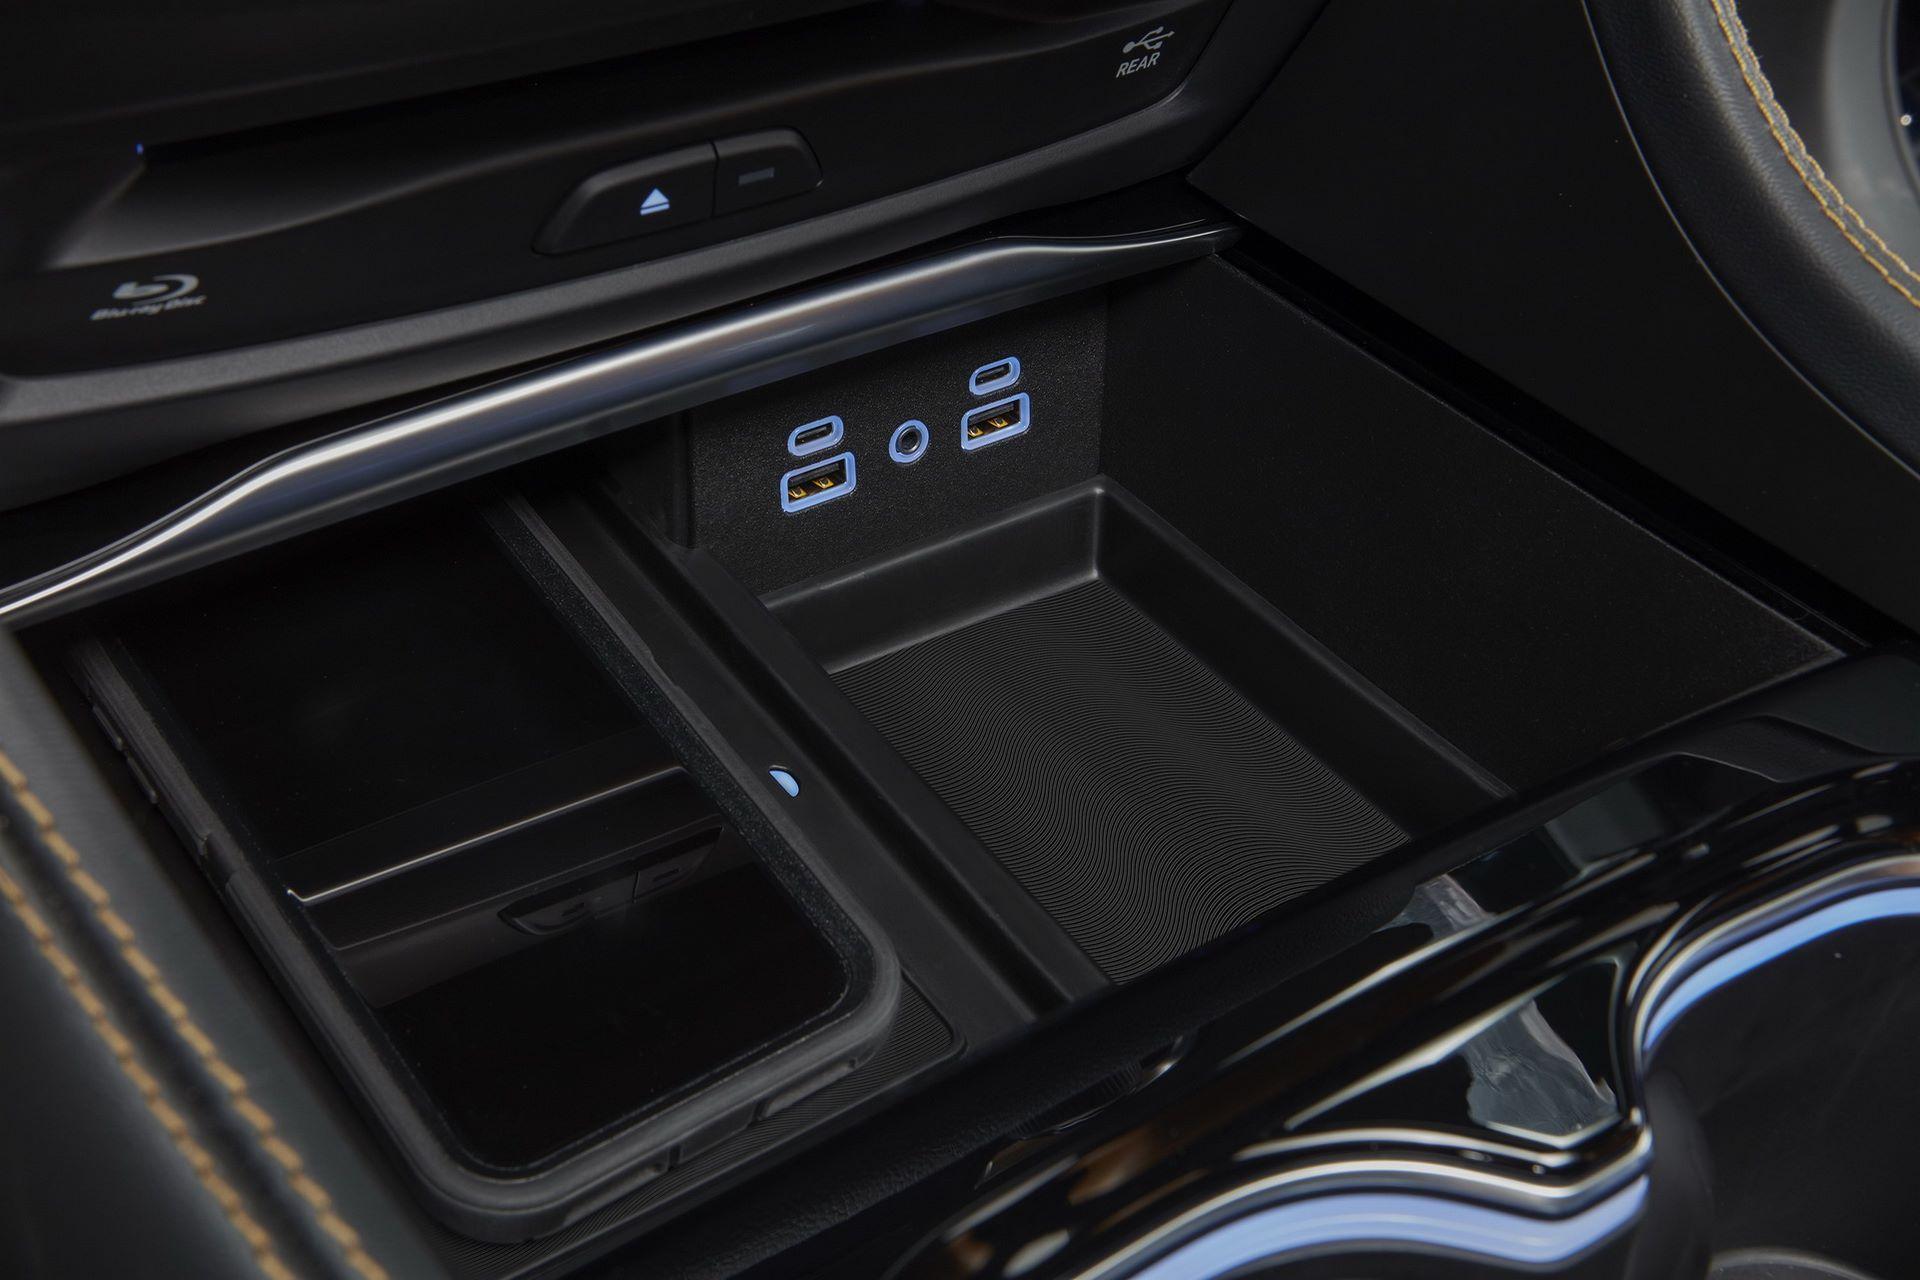 2021-Chrysler-Pacifica-66